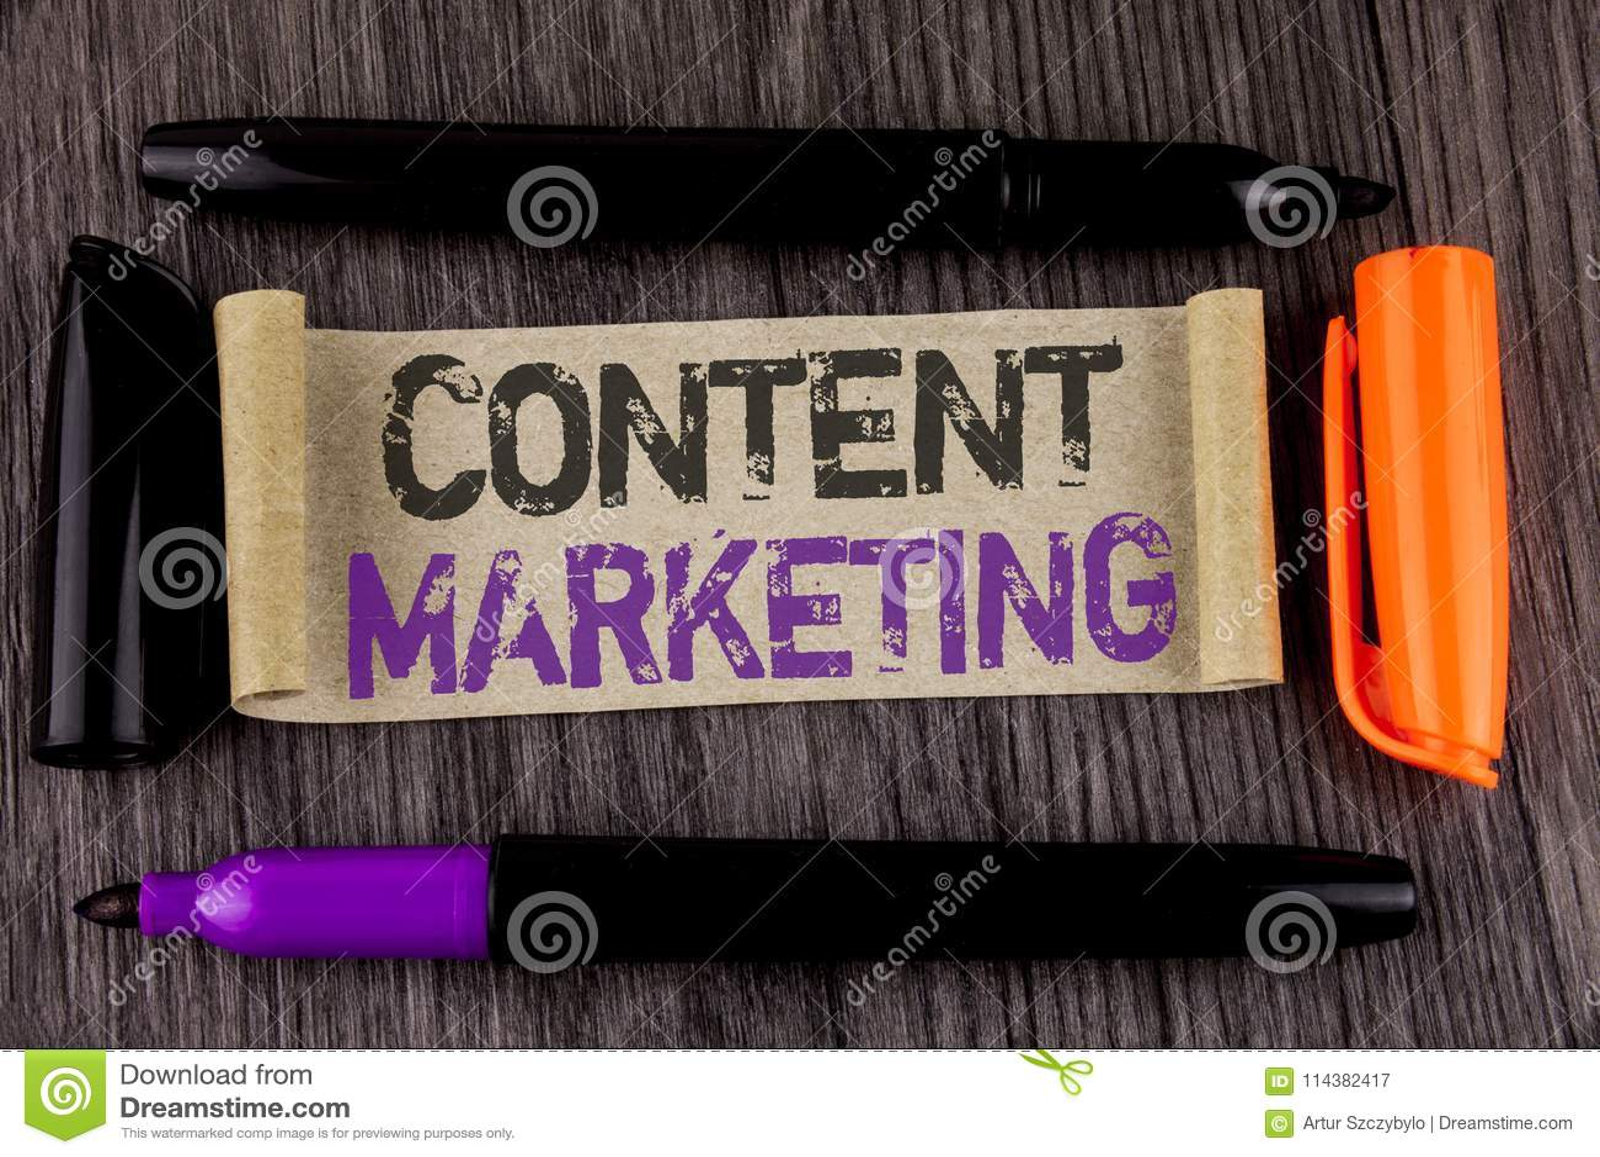 paint marketing strategy